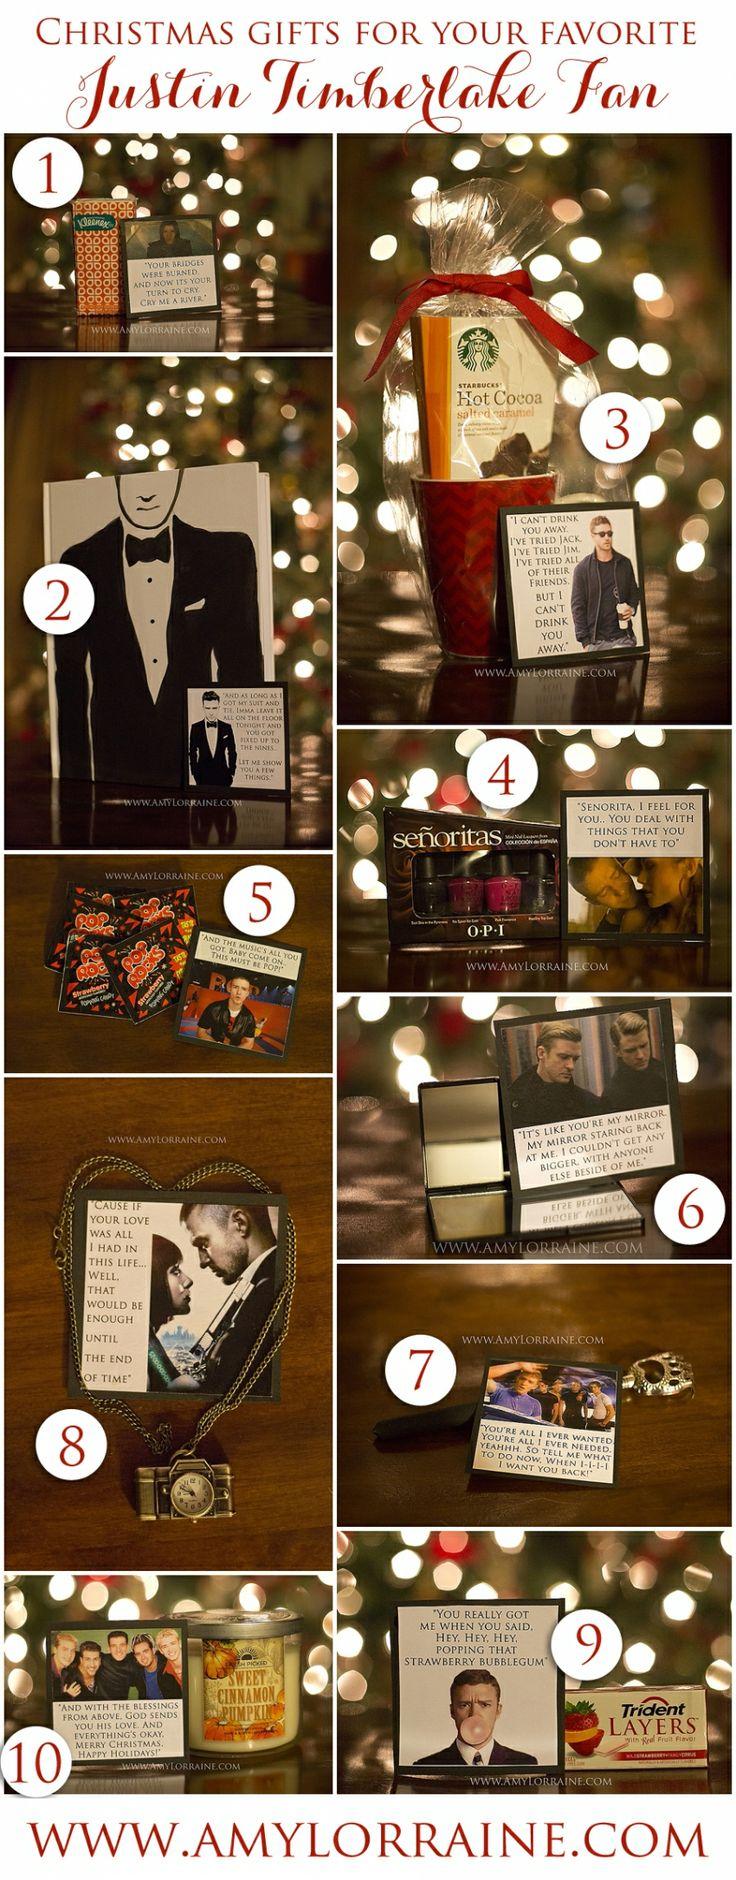 Present For A Justin Timberlake Fan www.amylorraine.com